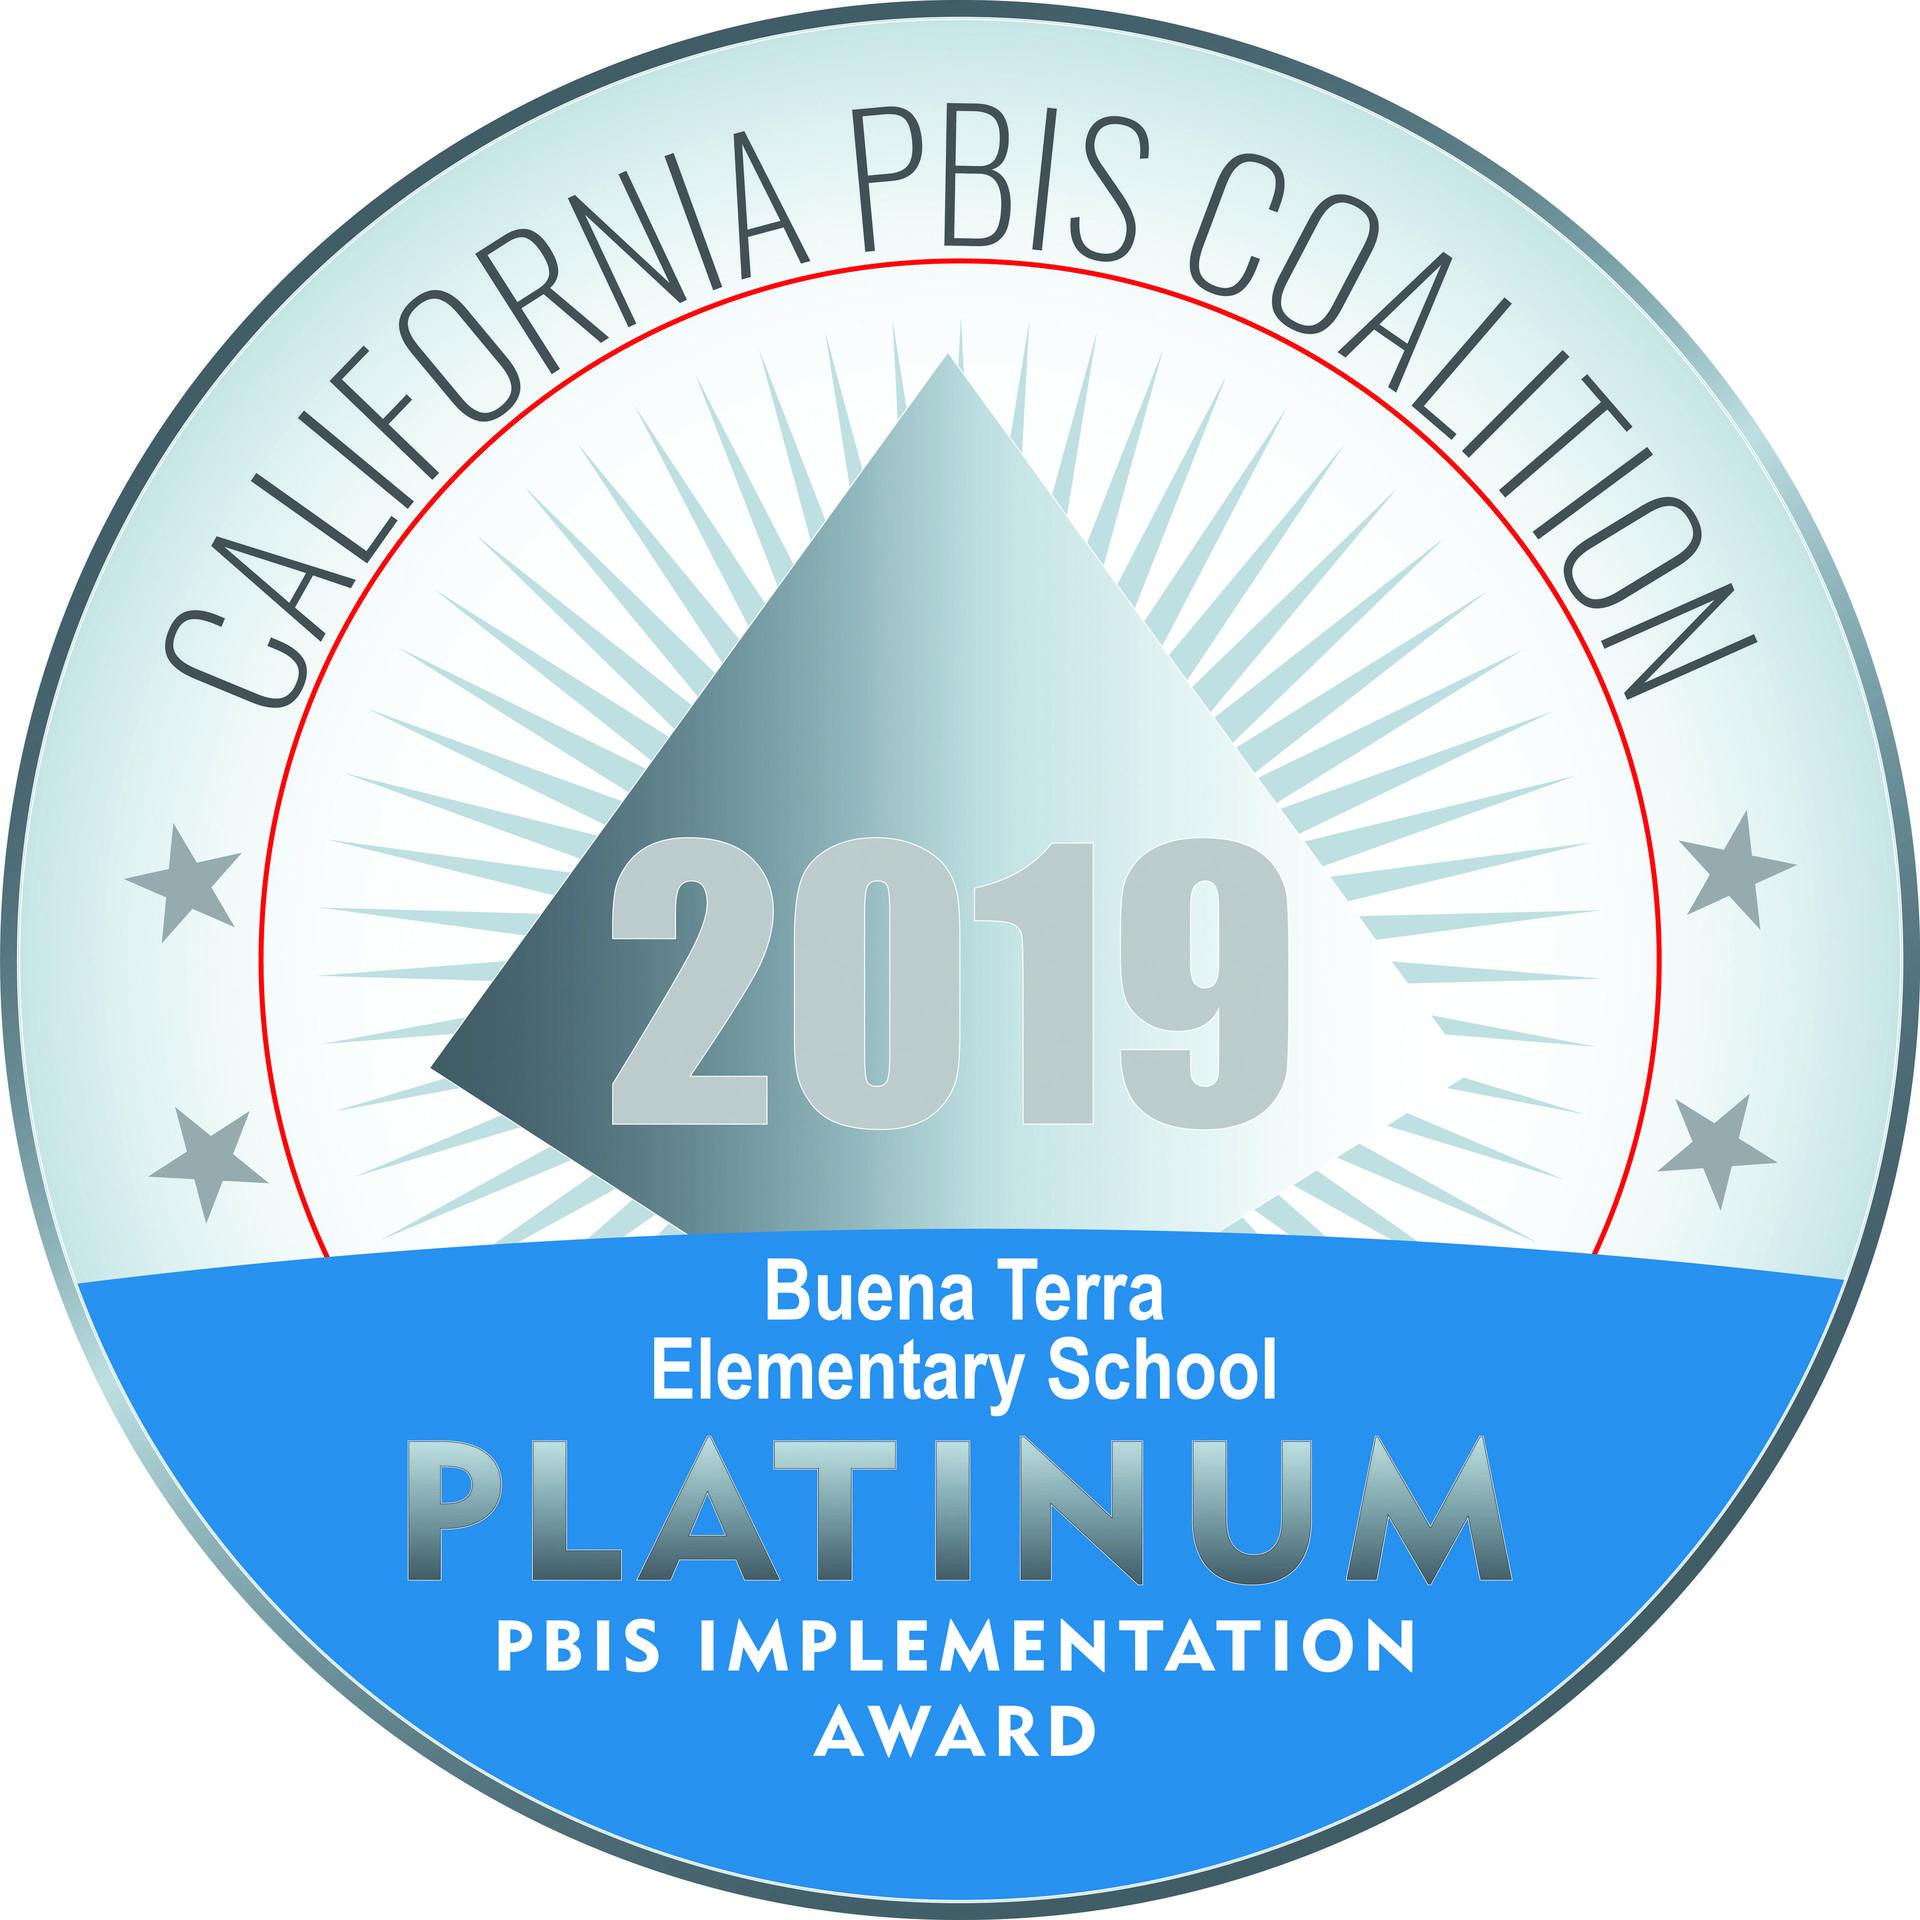 PBIS Medal